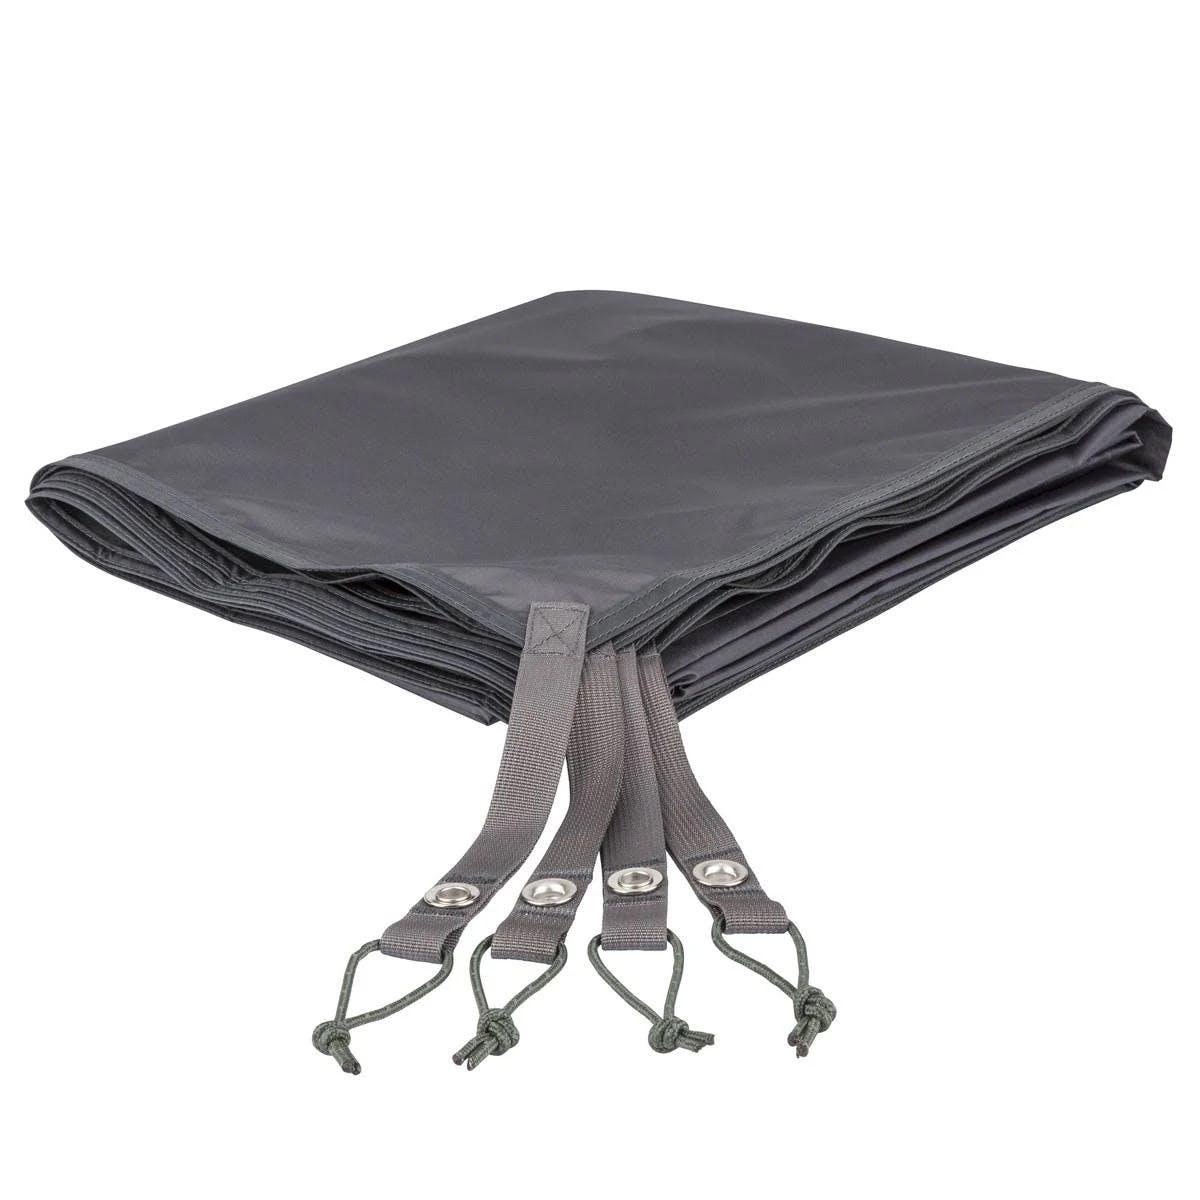 Marmot Nighthawk 2p Footprint - One Size / Slate Grey